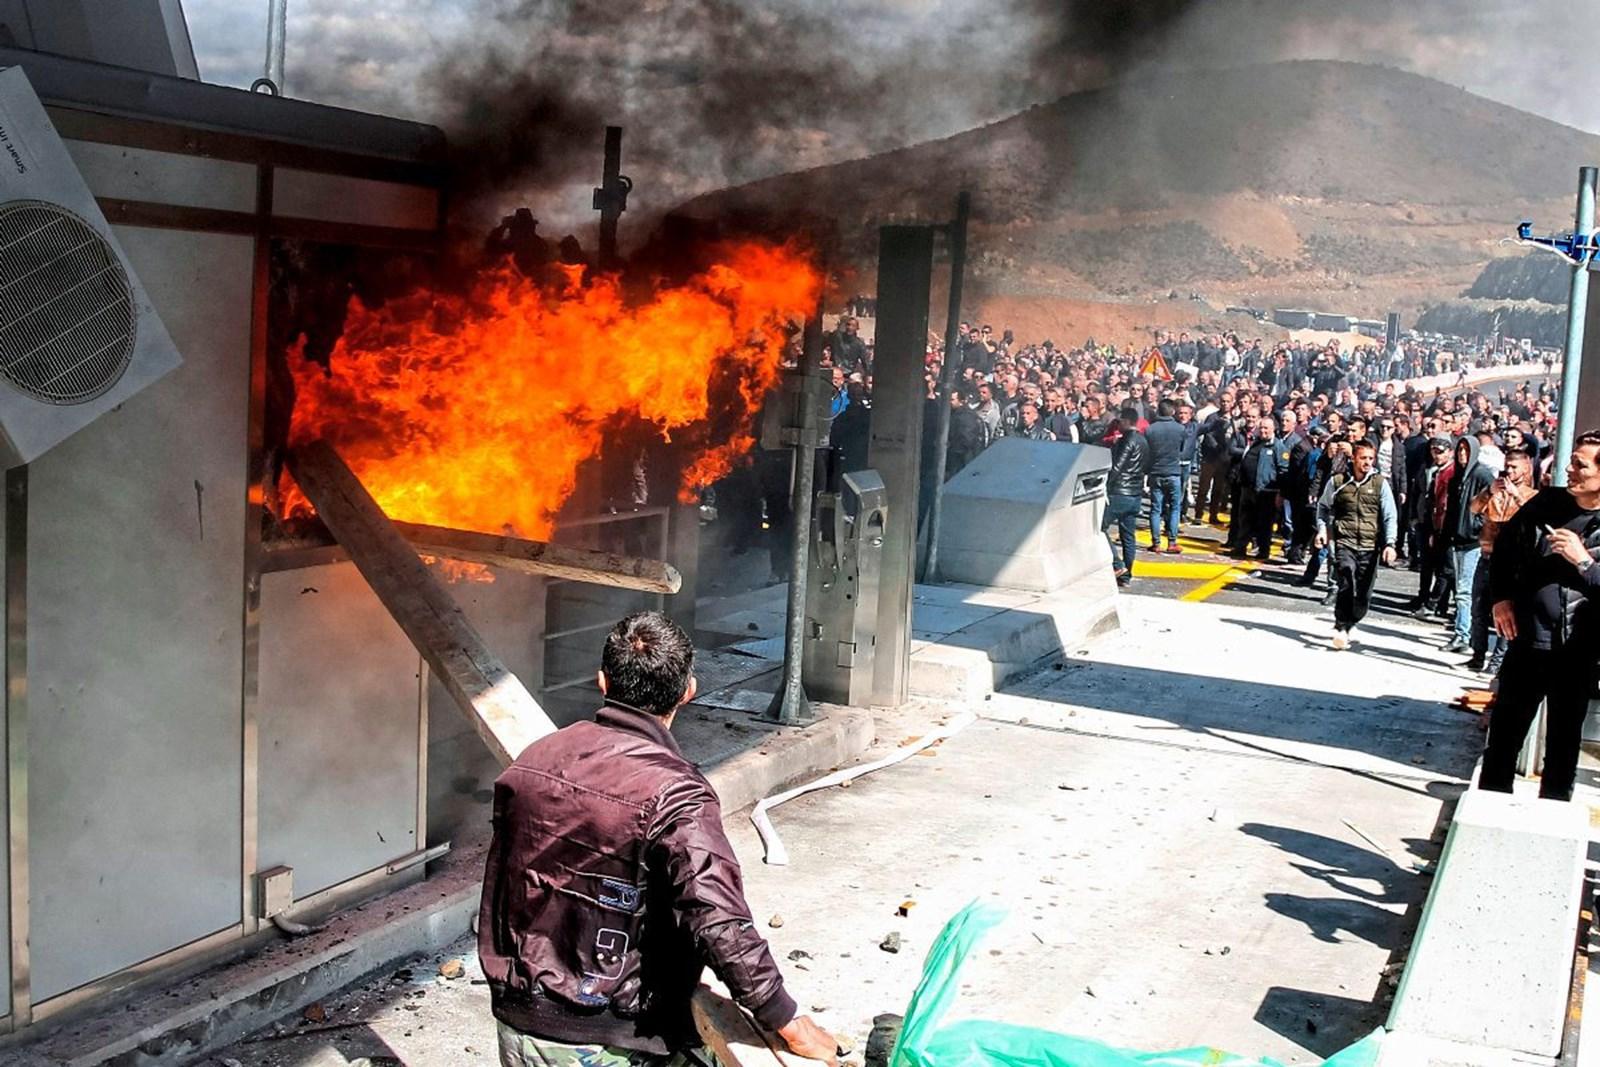 Албания: Протест против платы за проезд